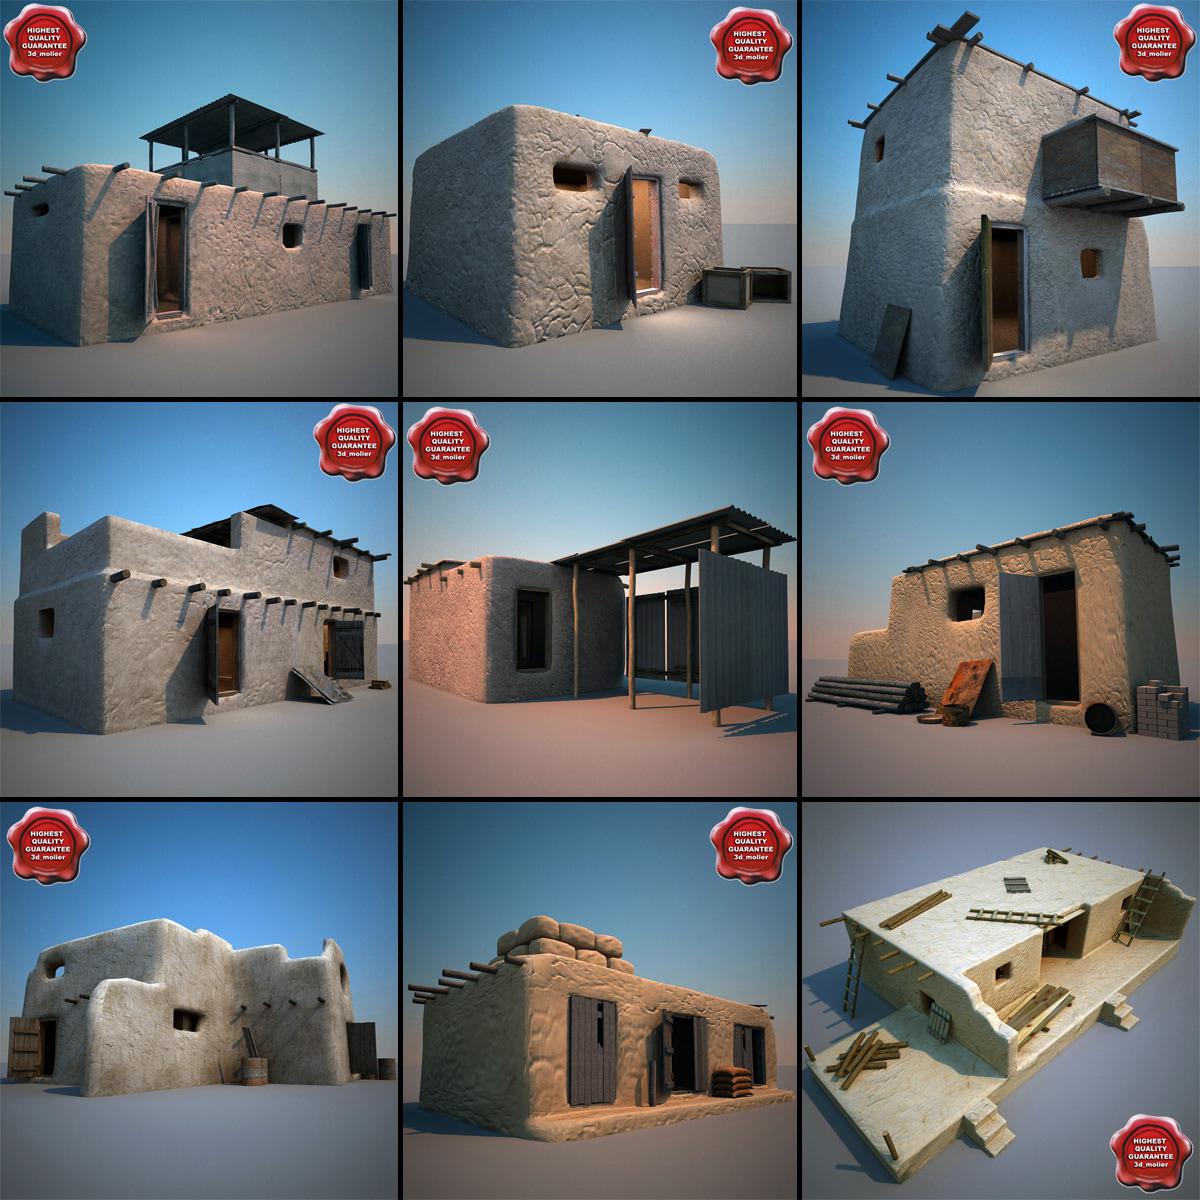 Afghanistan_Houses_Collection_V3_000.jpg